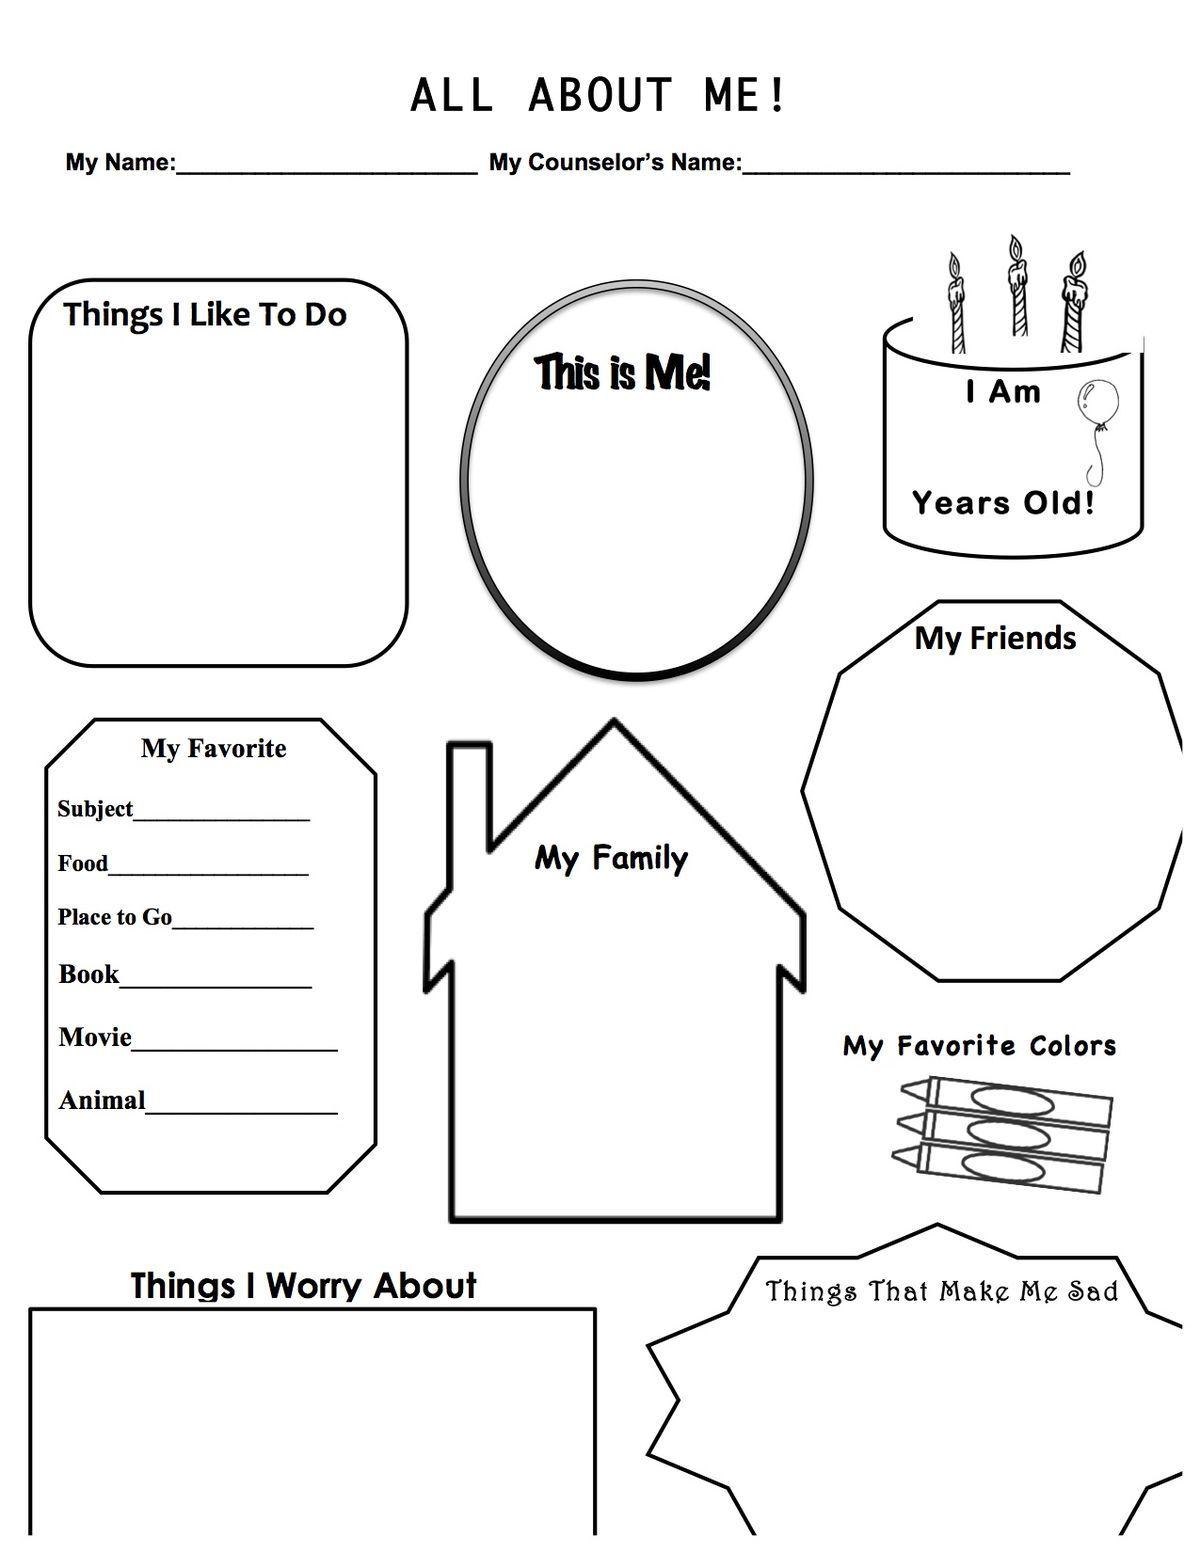 worksheet Cbt Problem Solving Worksheets e2c8b40297342be24c0c78be6fde8e6b jpg pixels wiggle kids education